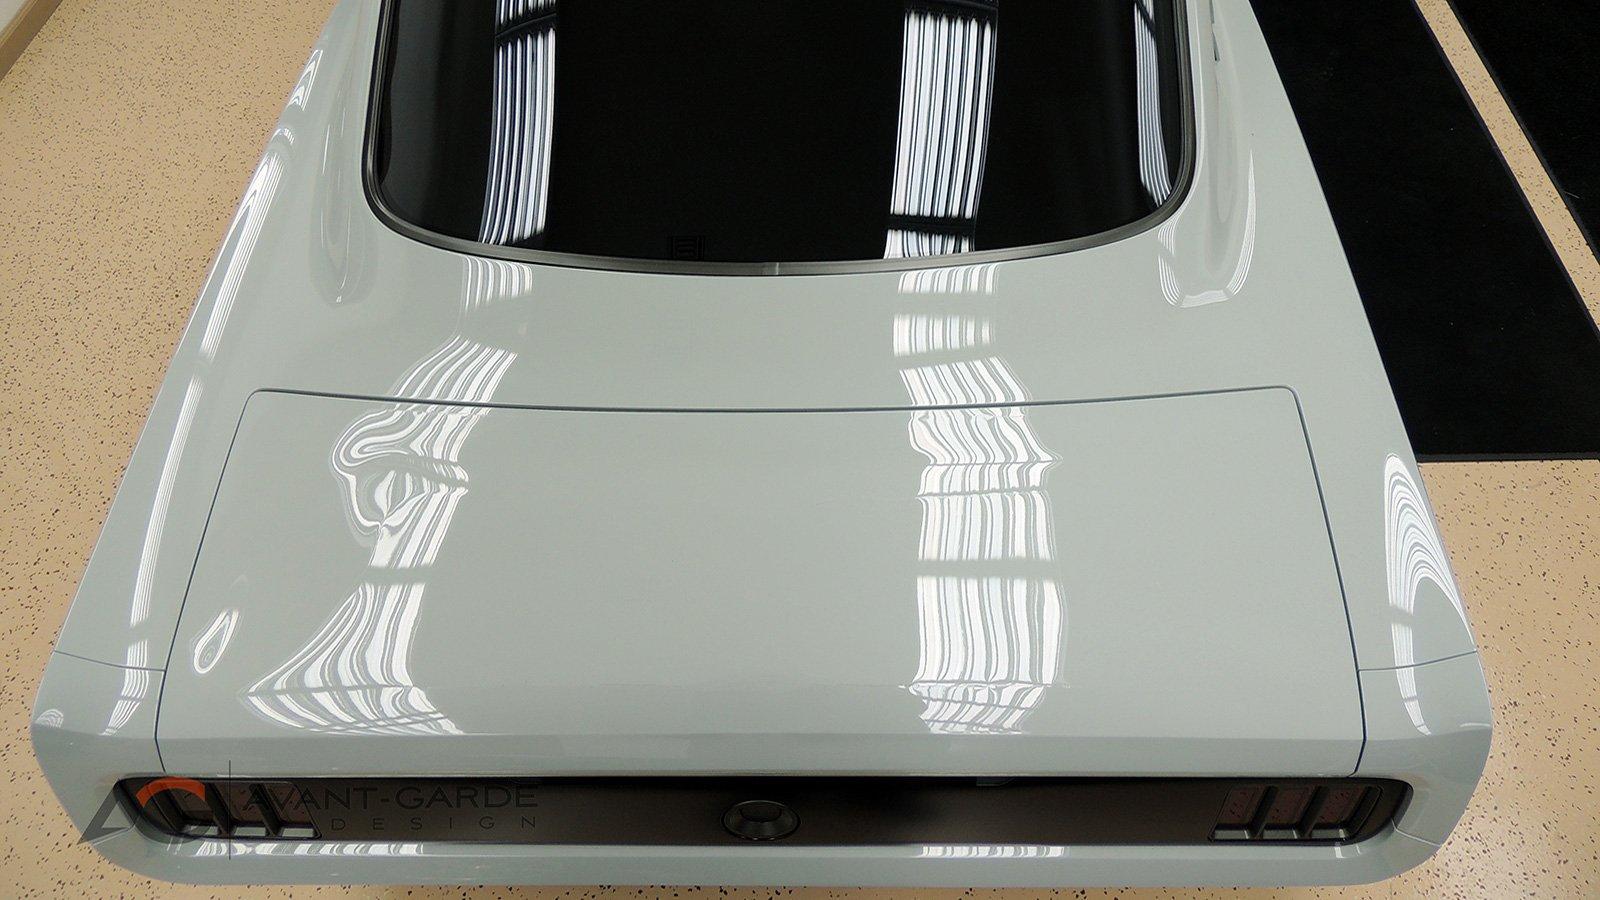 65-mustang-vapor-exterior-trunk